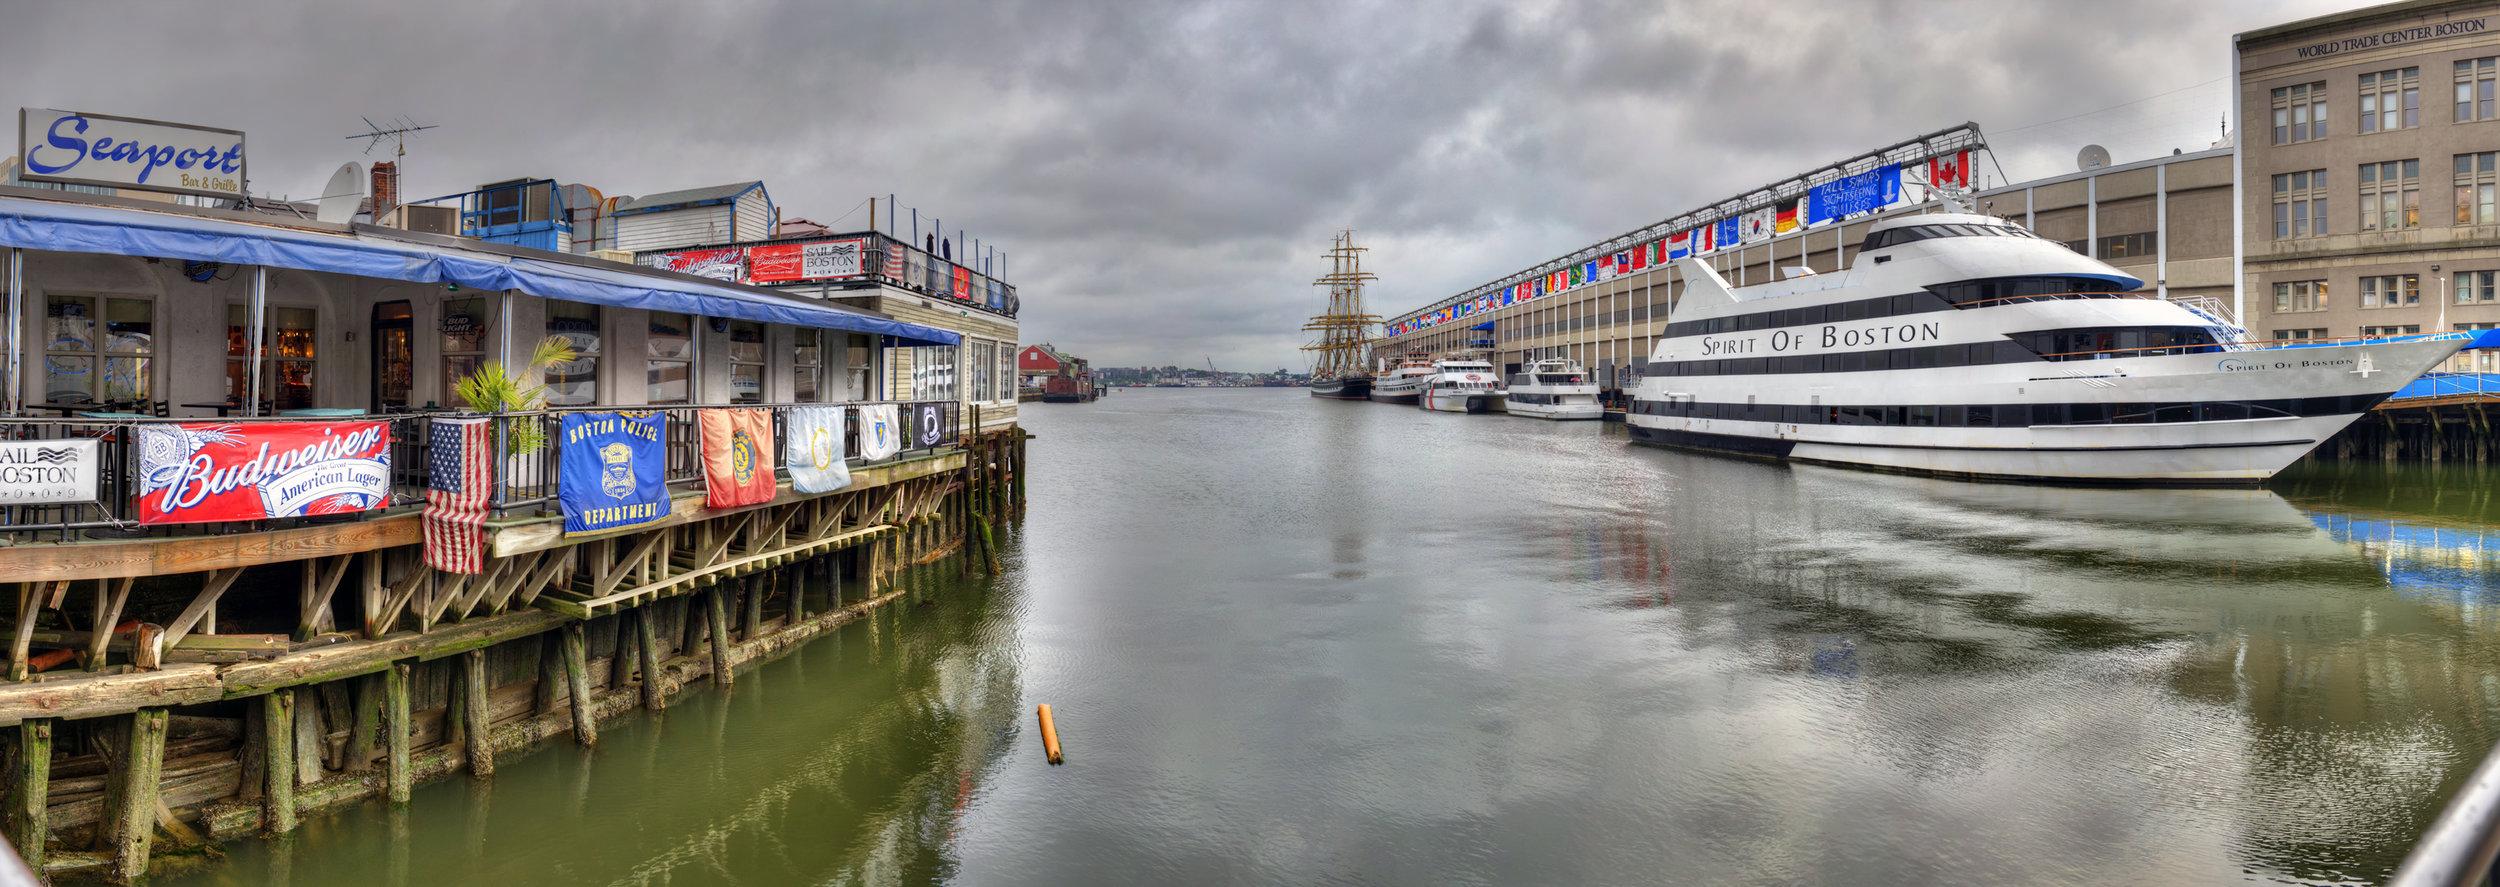 Seaport Grille Boston Harbor